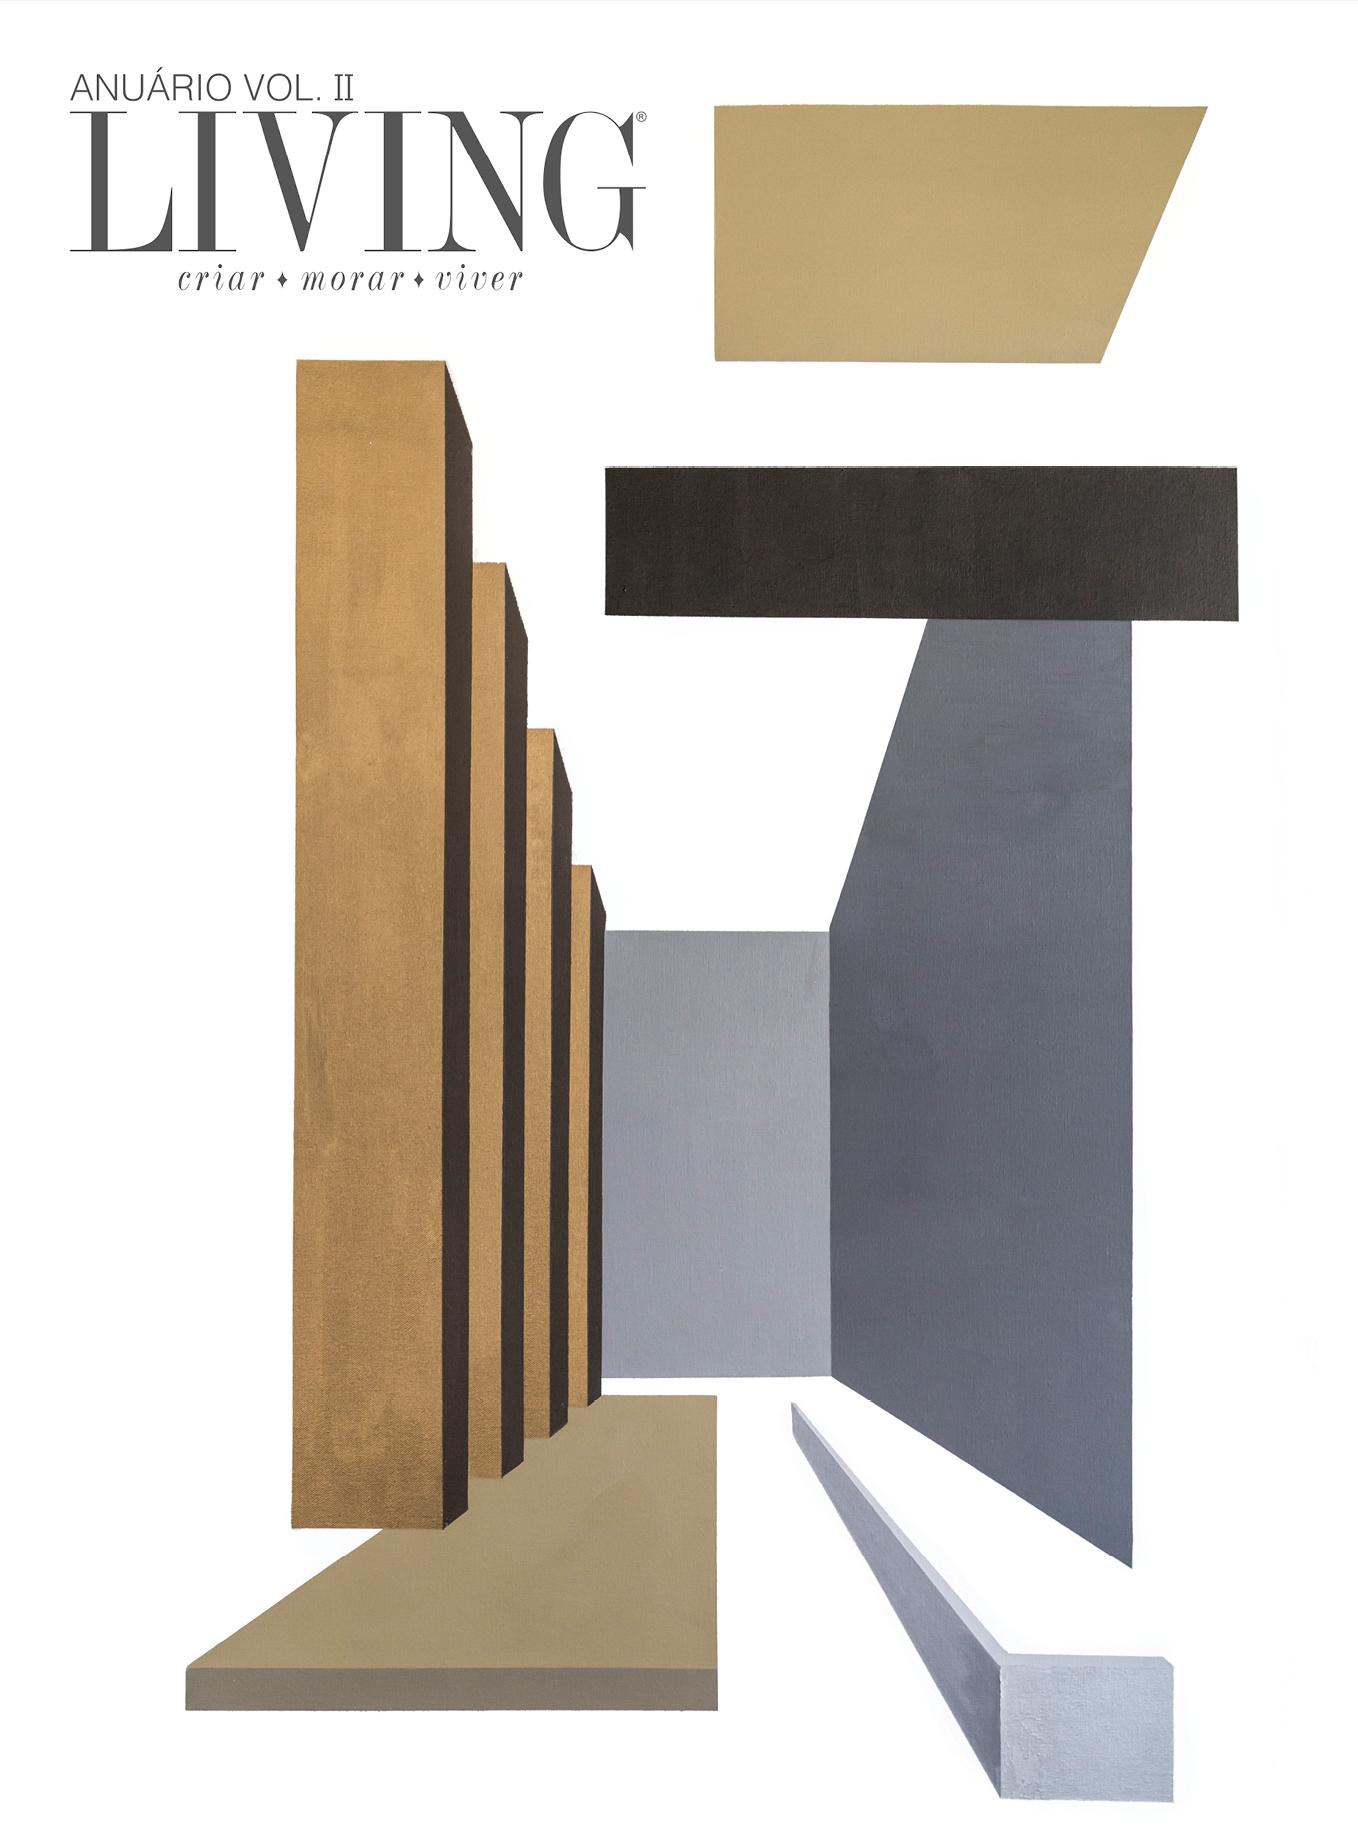 Anuário - Volume II